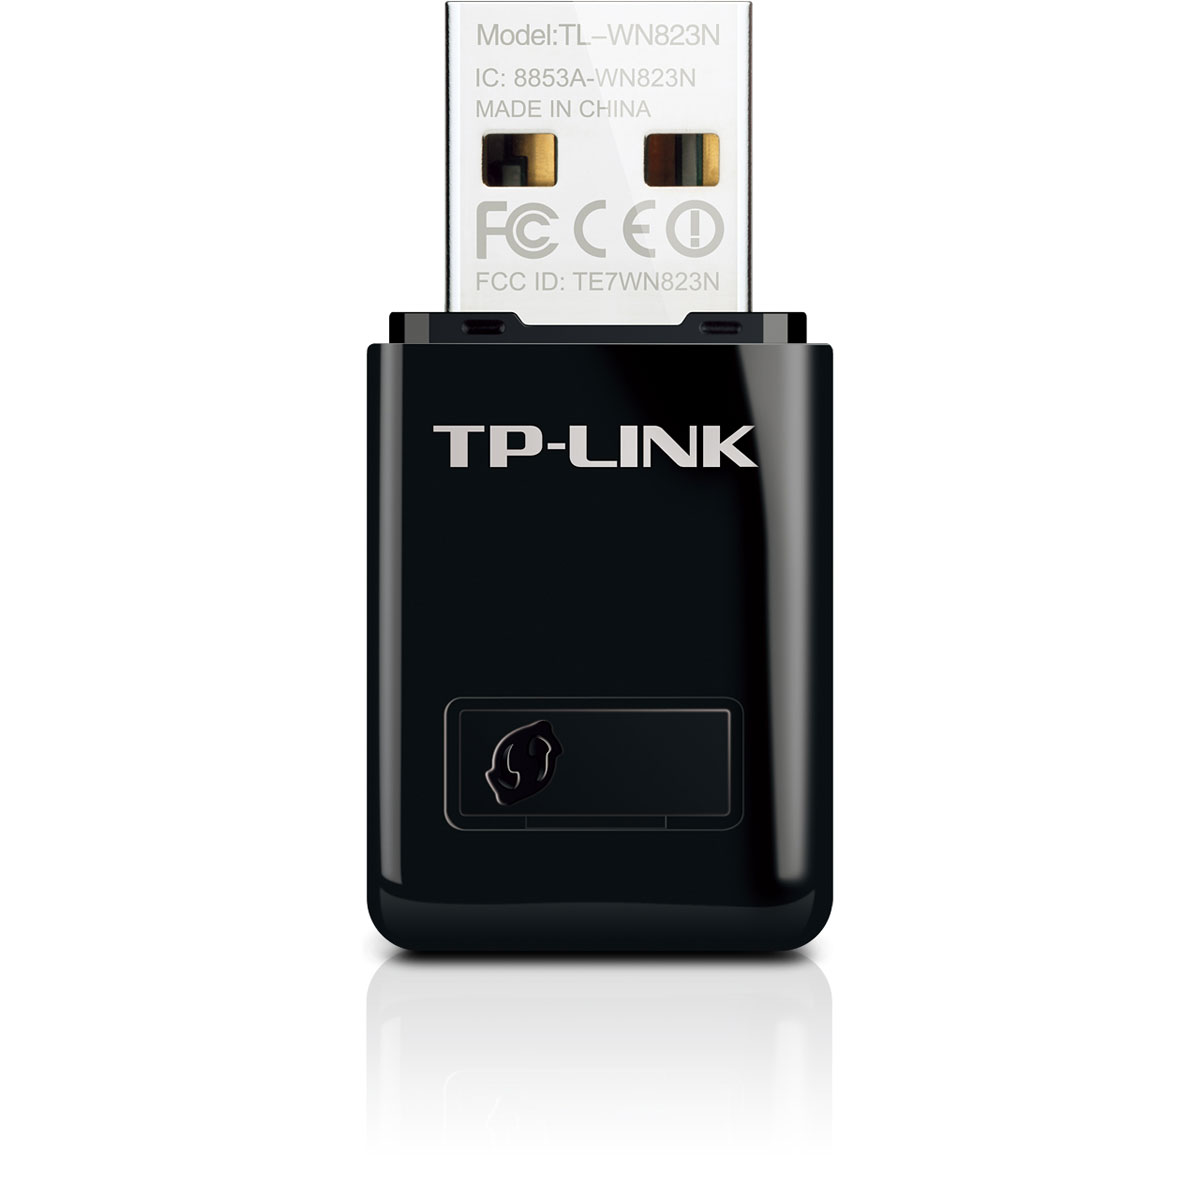 Carte réseau TP-LINK TL-WN823N mini Clé USB WiFi N 300 Mbps